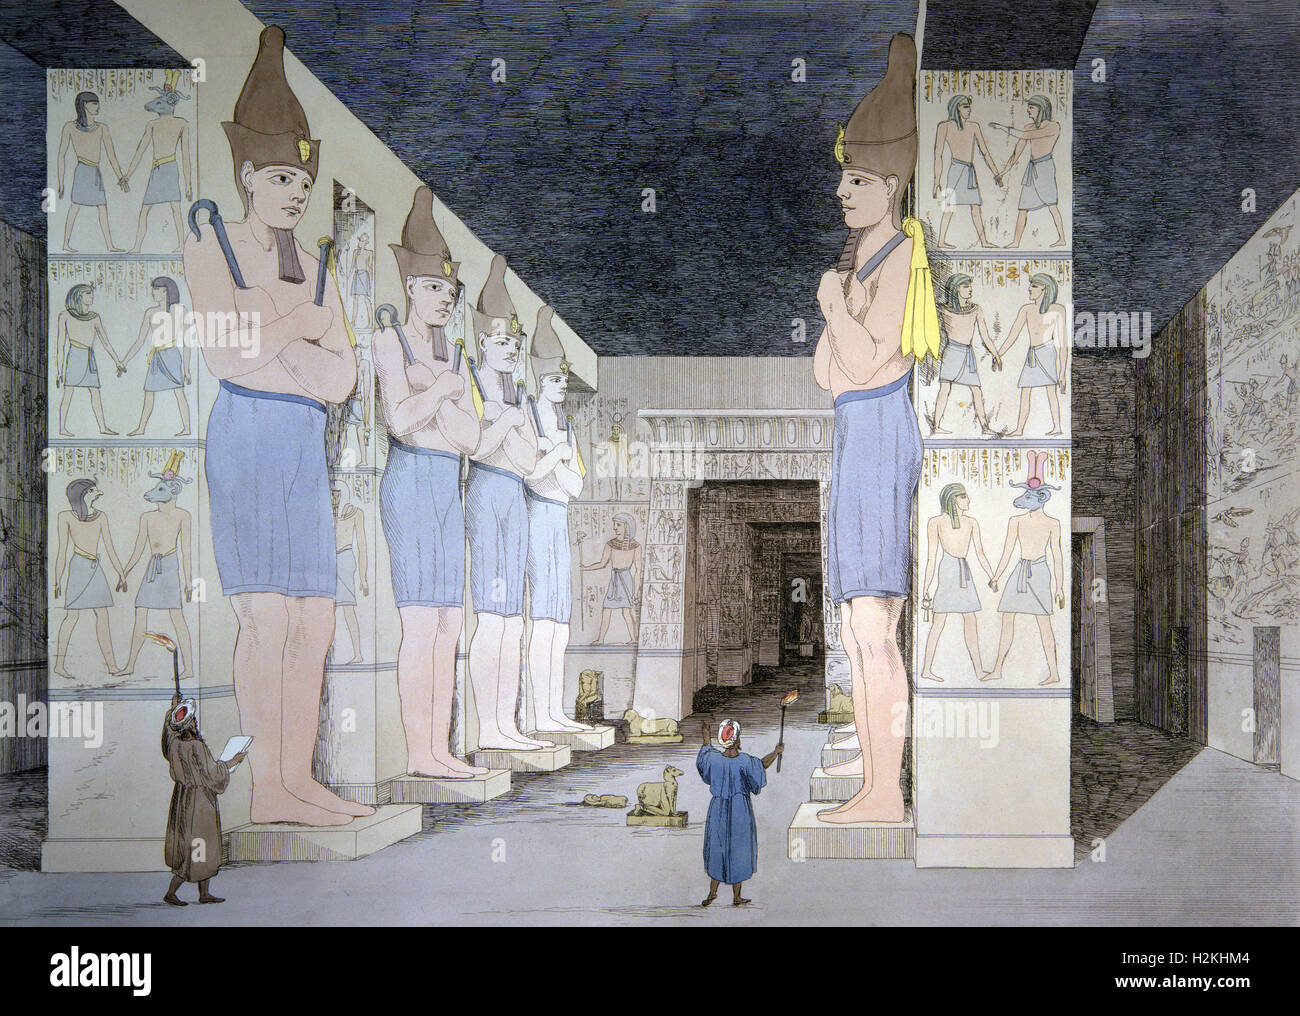 Engraving -Inside the temple of Abu Simbel - Egypt - Stock Image